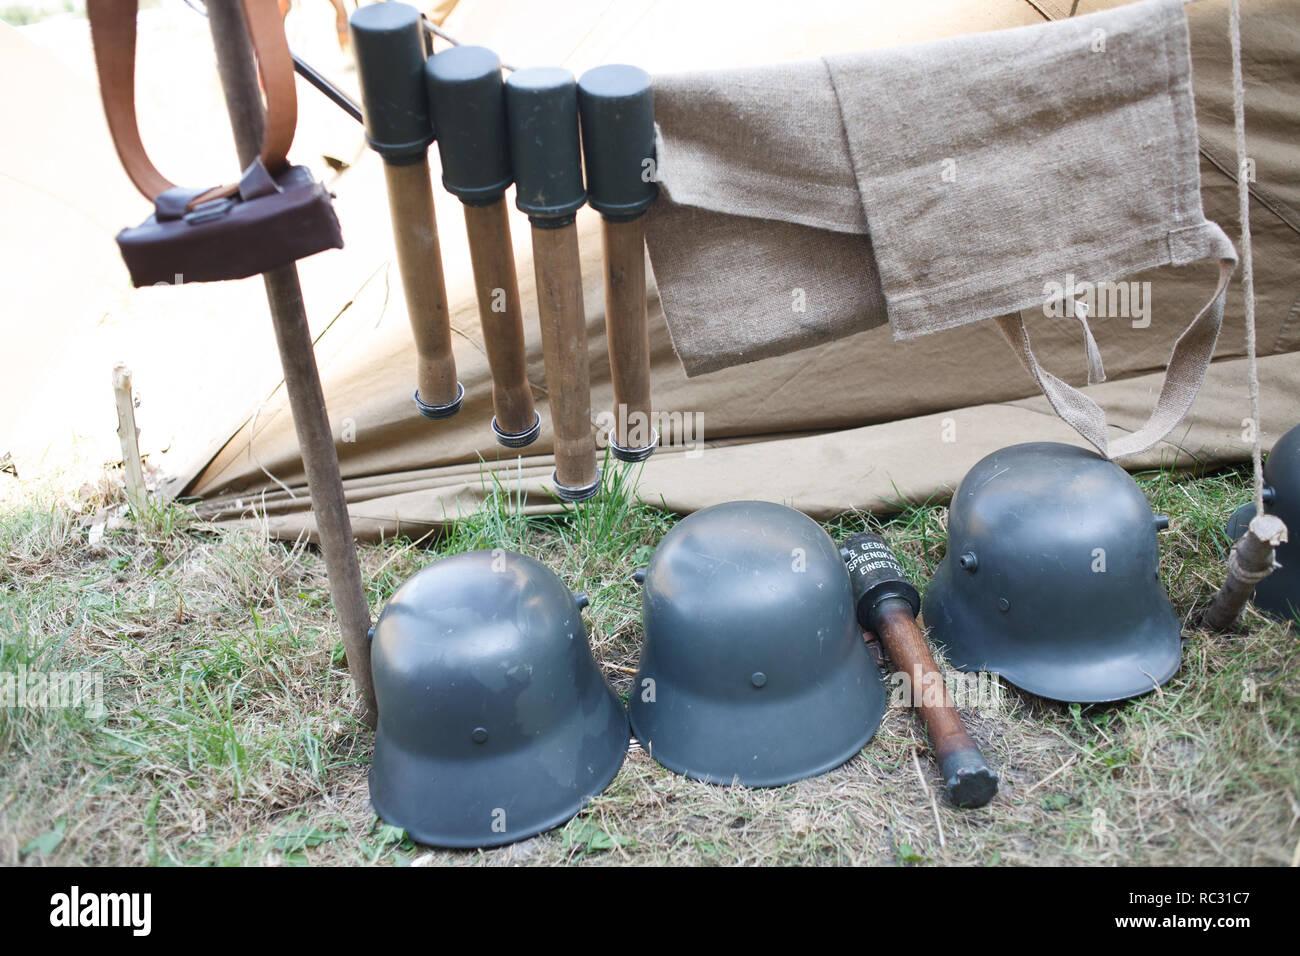 Rifles pyramids with ammunition and german steel helmet, First World War-era reenactment - Stock Image